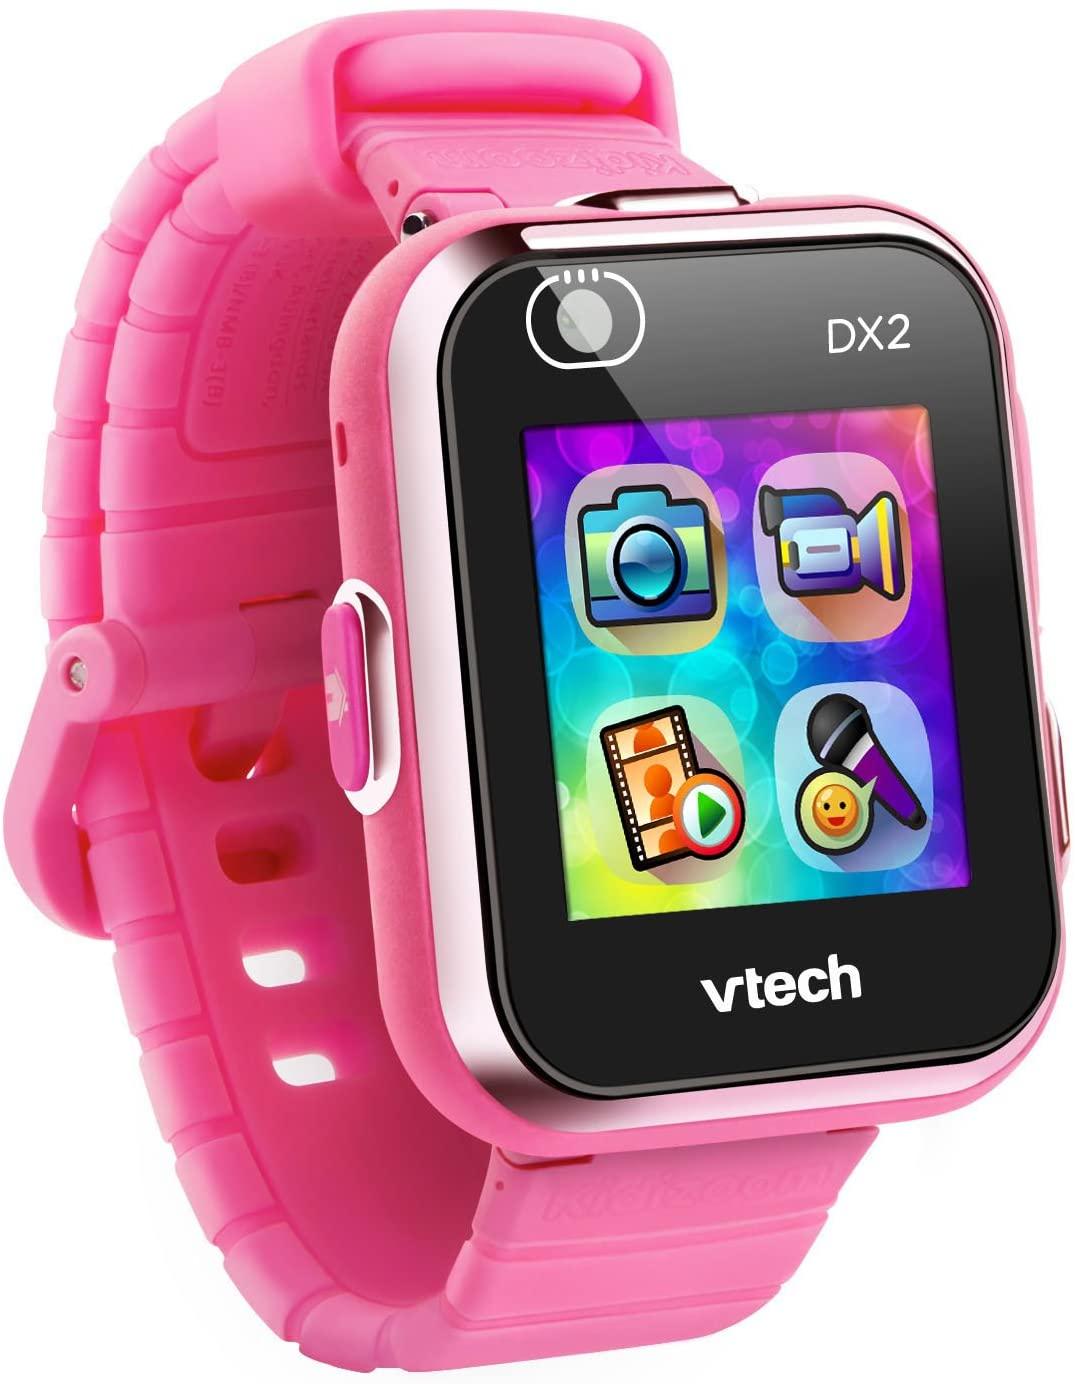 VTech 193853 Kidizoom Smart Watch, Pink £25.89 @ Amazon Prime